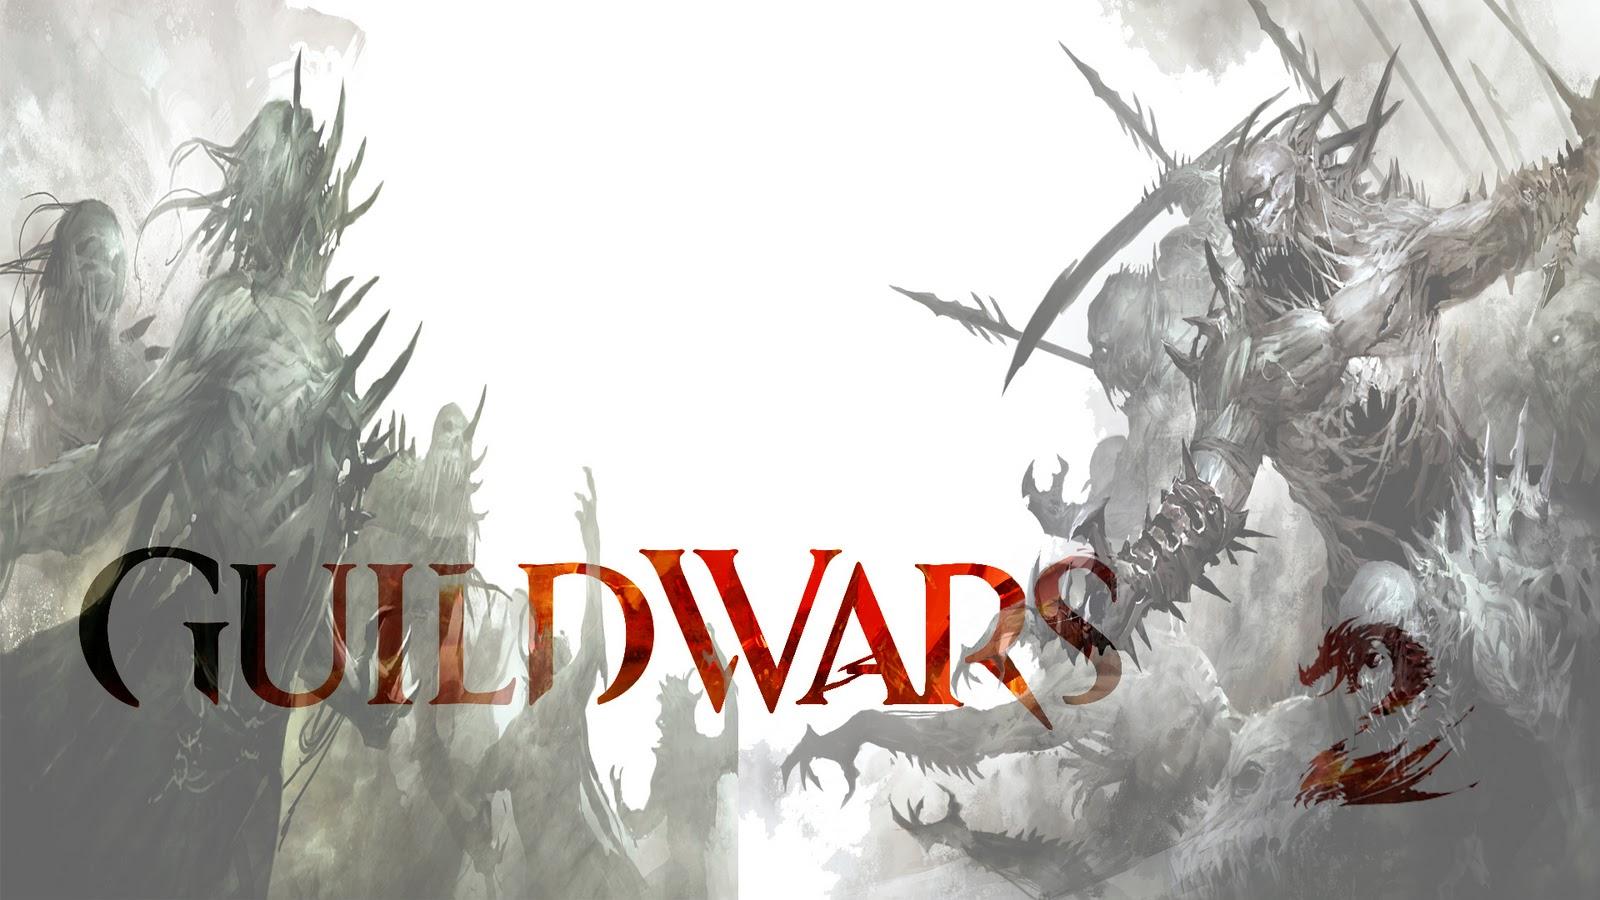 Guild Wars 2 Video Games Charr Wallpapers Hd Desktop: Guild Wars 2 Wallpaper